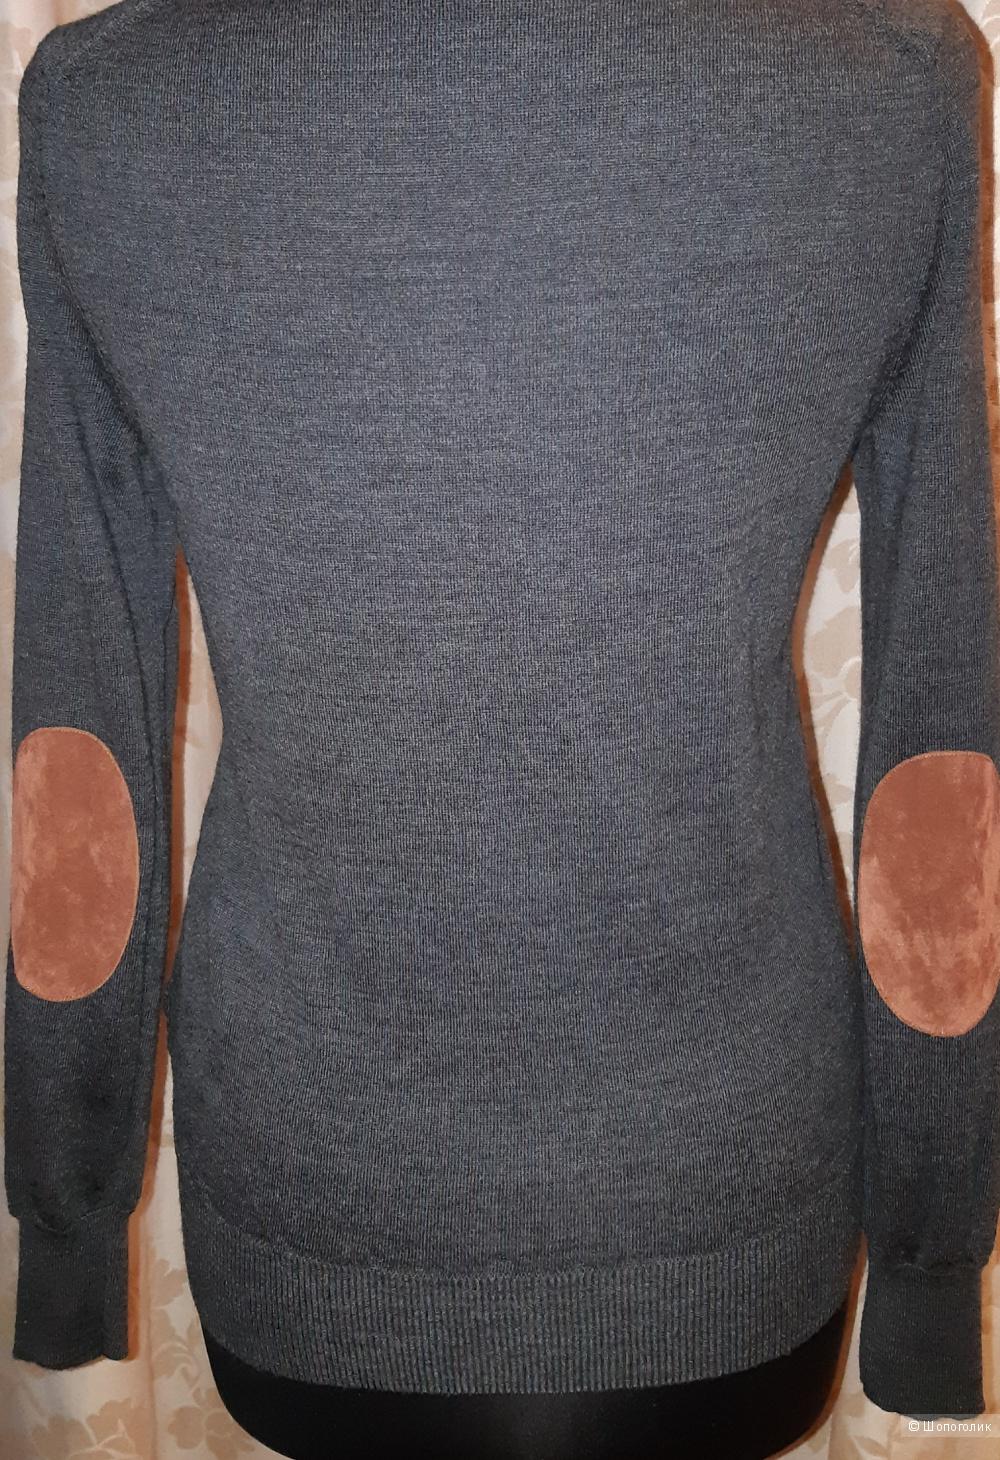 Кардиган peter hahn, размер 44-46